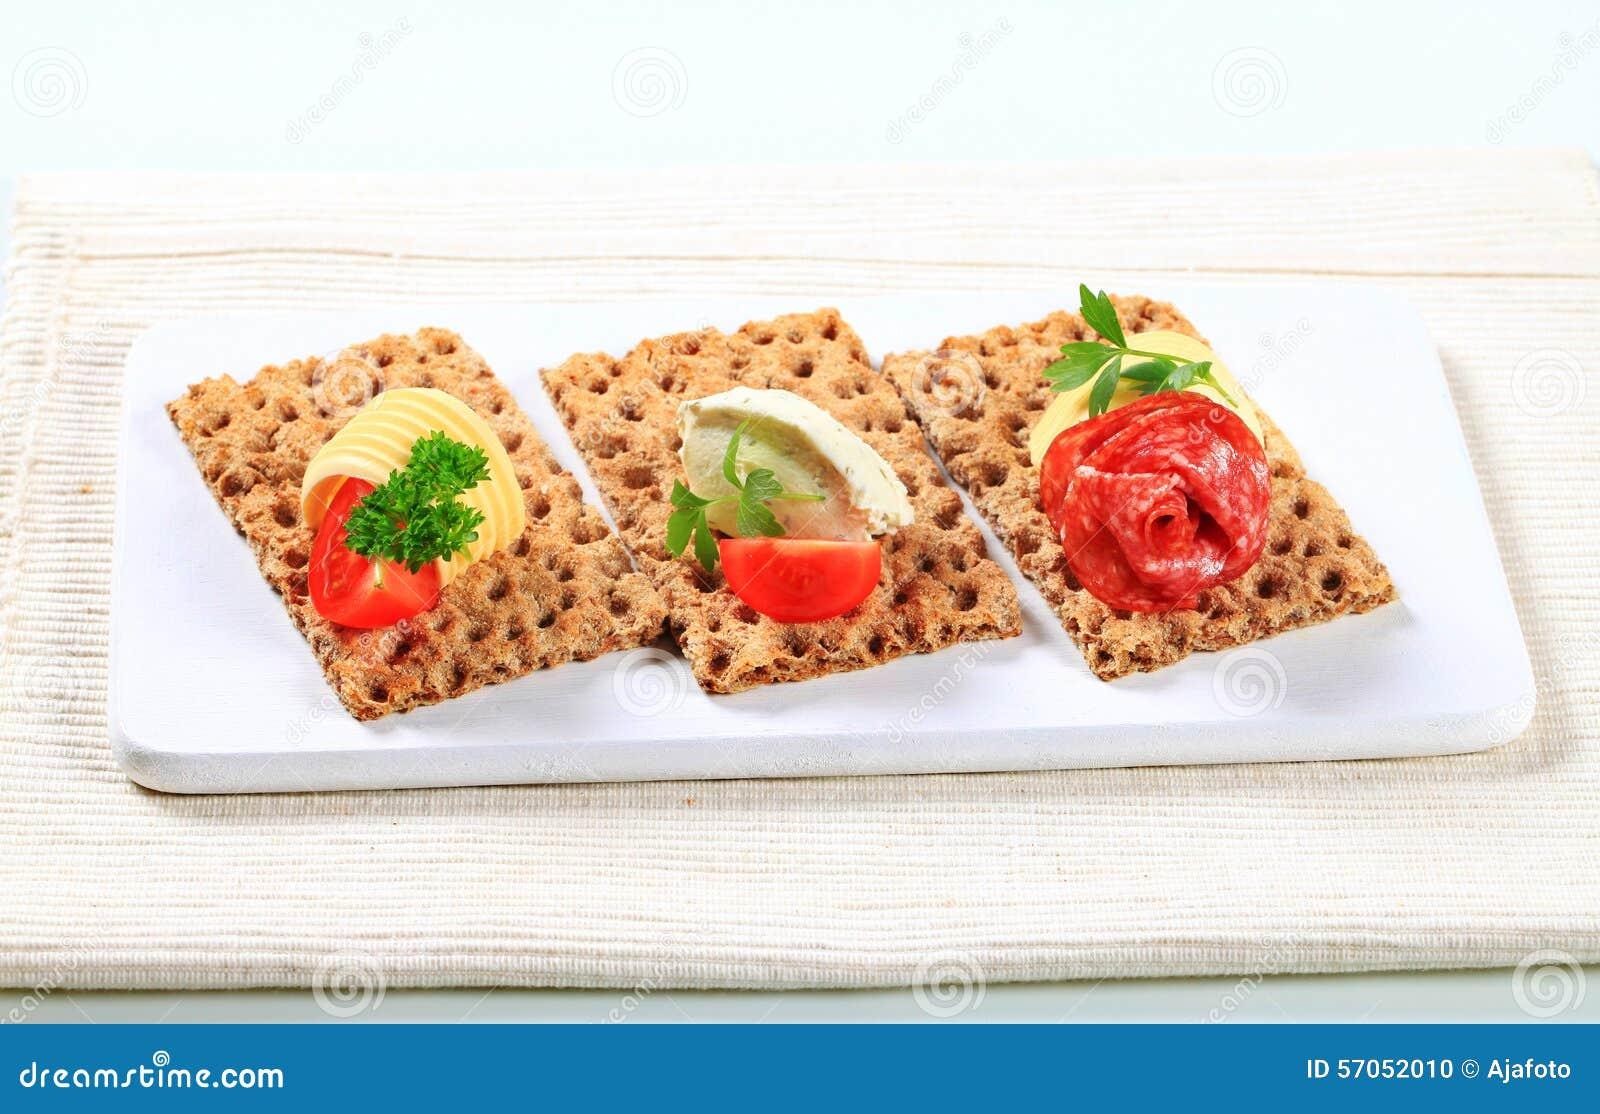 Geheel korrelknäckebrood met diverse bovenste laagjes